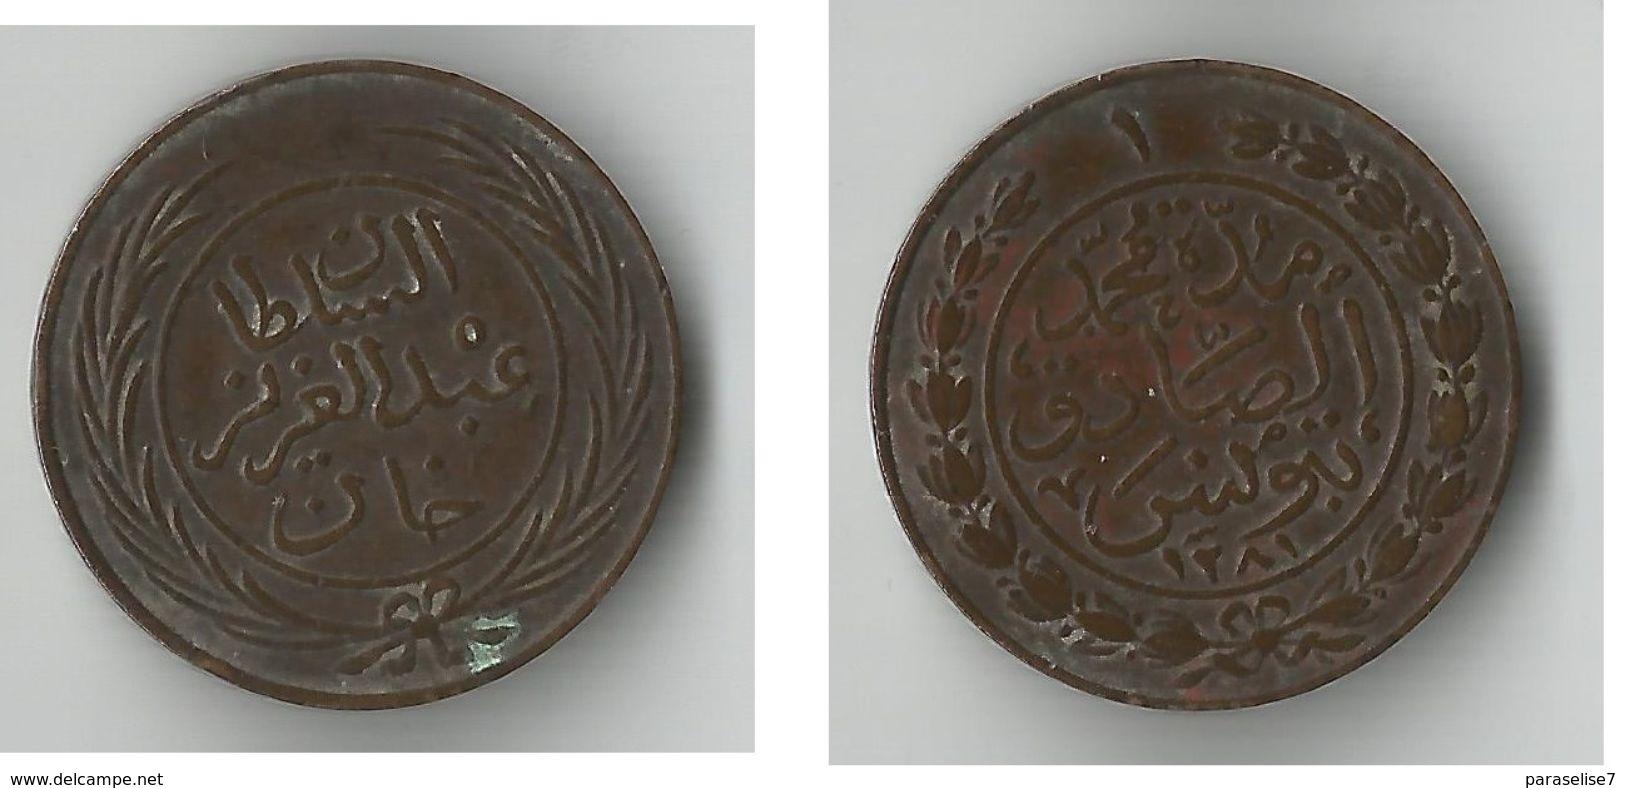 TUNUSIE 1/2 KHARUB 1265 - Tunisie